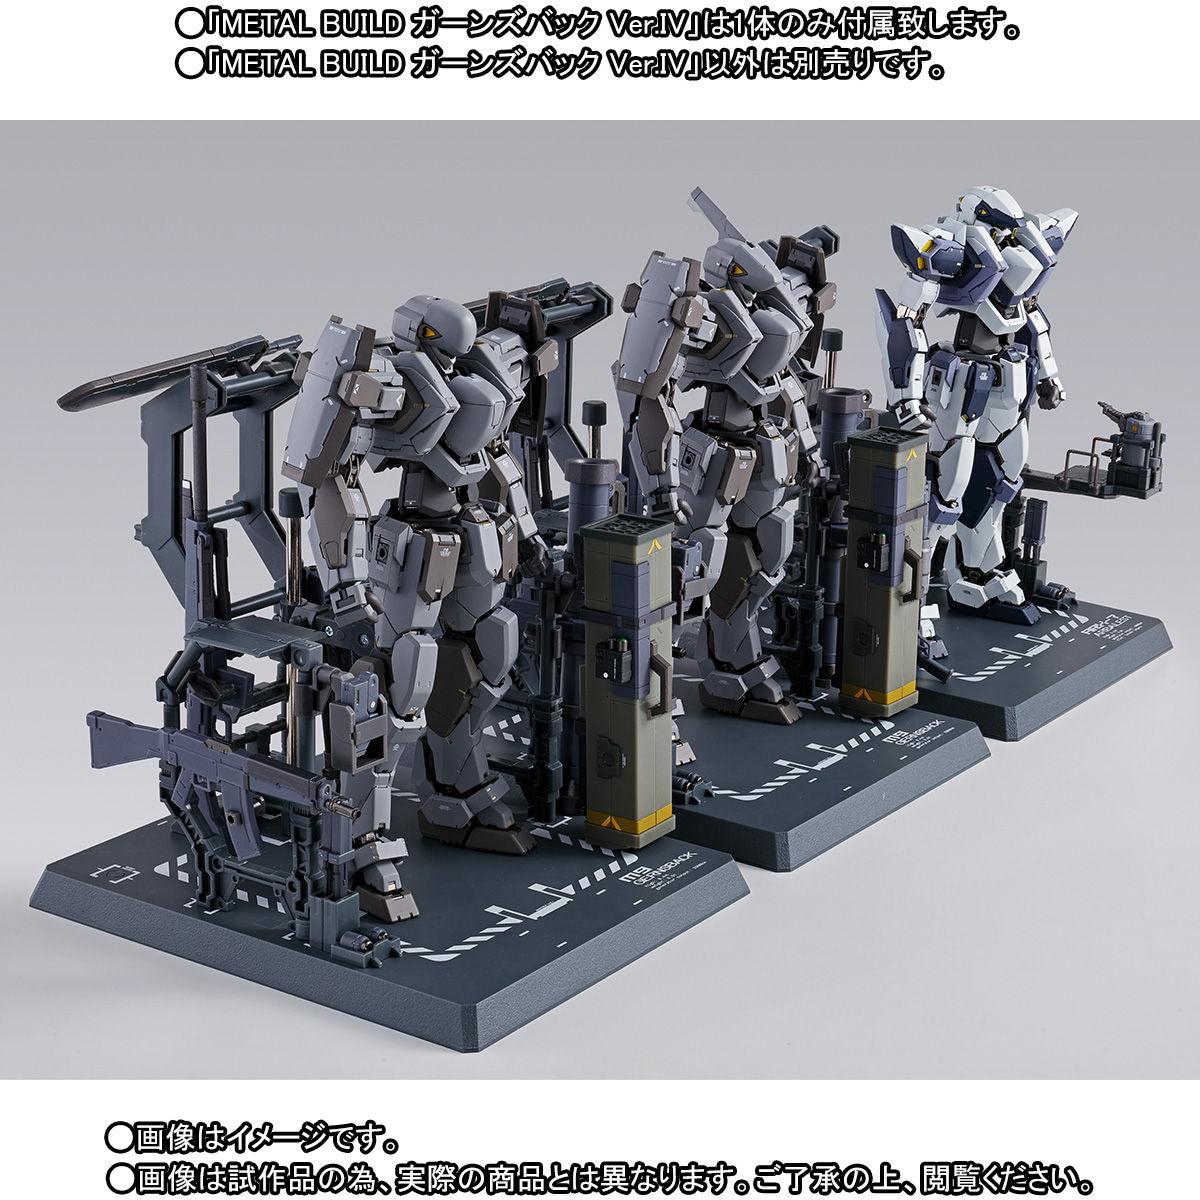 METAL BUILD『ガーンズバック Ver.IV|フルメタル・パニック!IV』可動フィギュア-010